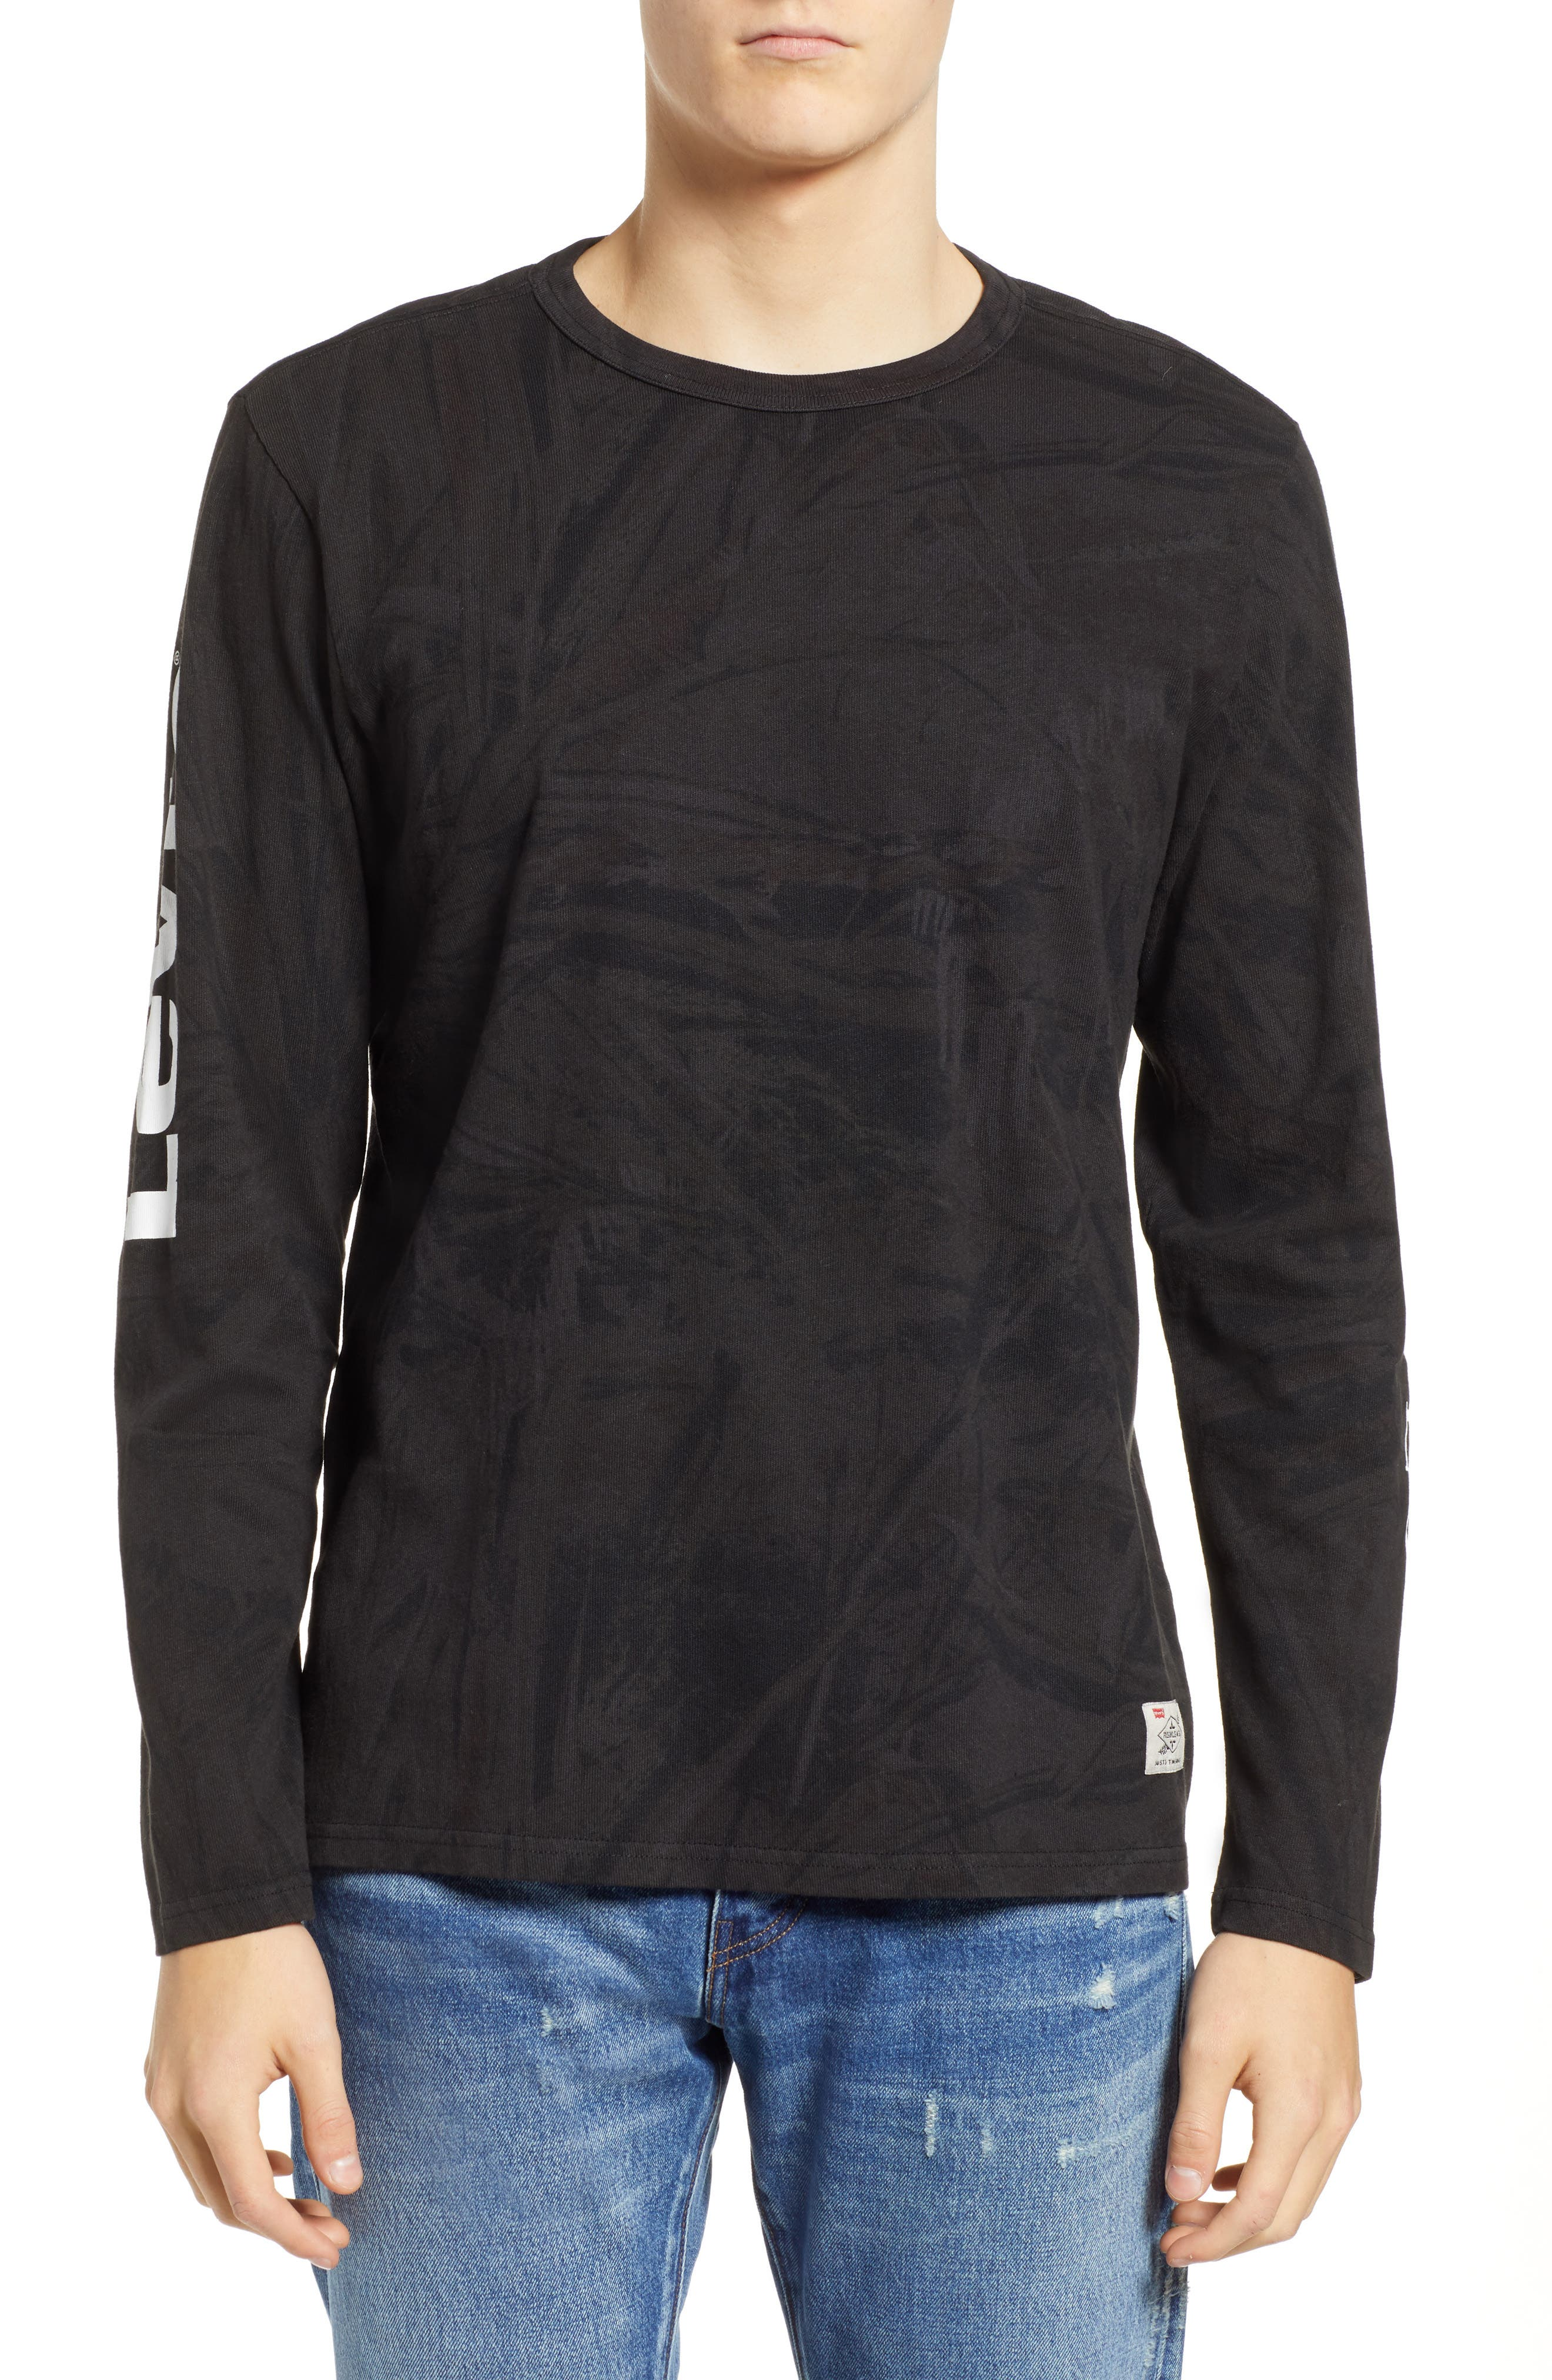 x Justin Timberlake Camo Long Sleeve T-Shirt,                             Main thumbnail 1, color,                             BLACK